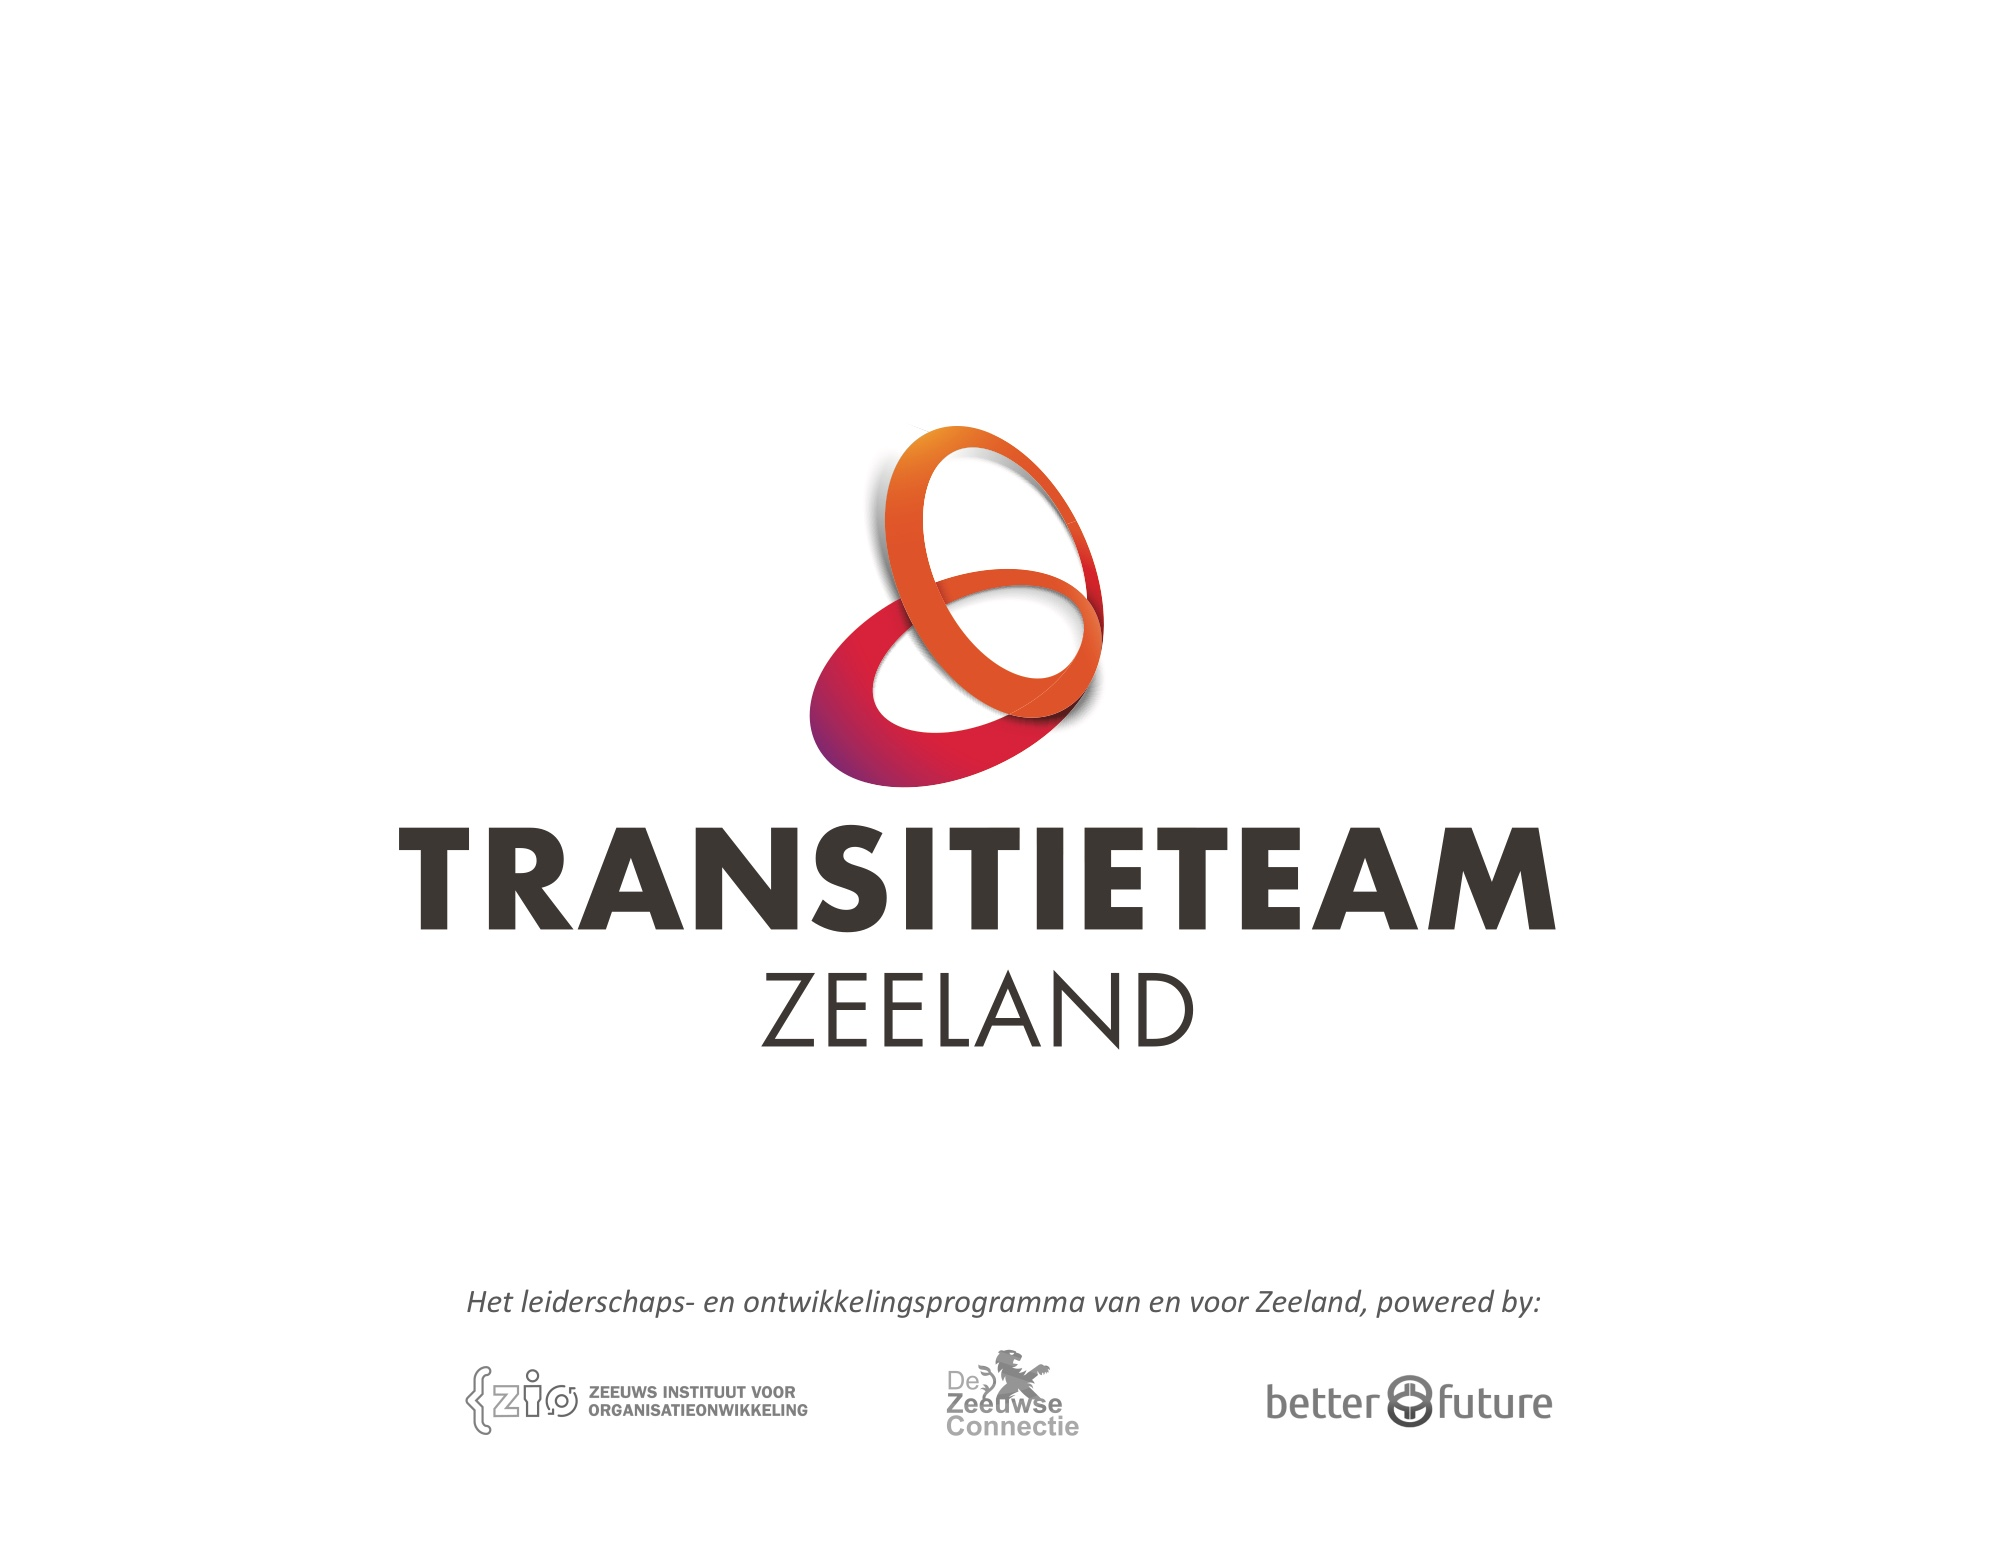 TransitieTeam